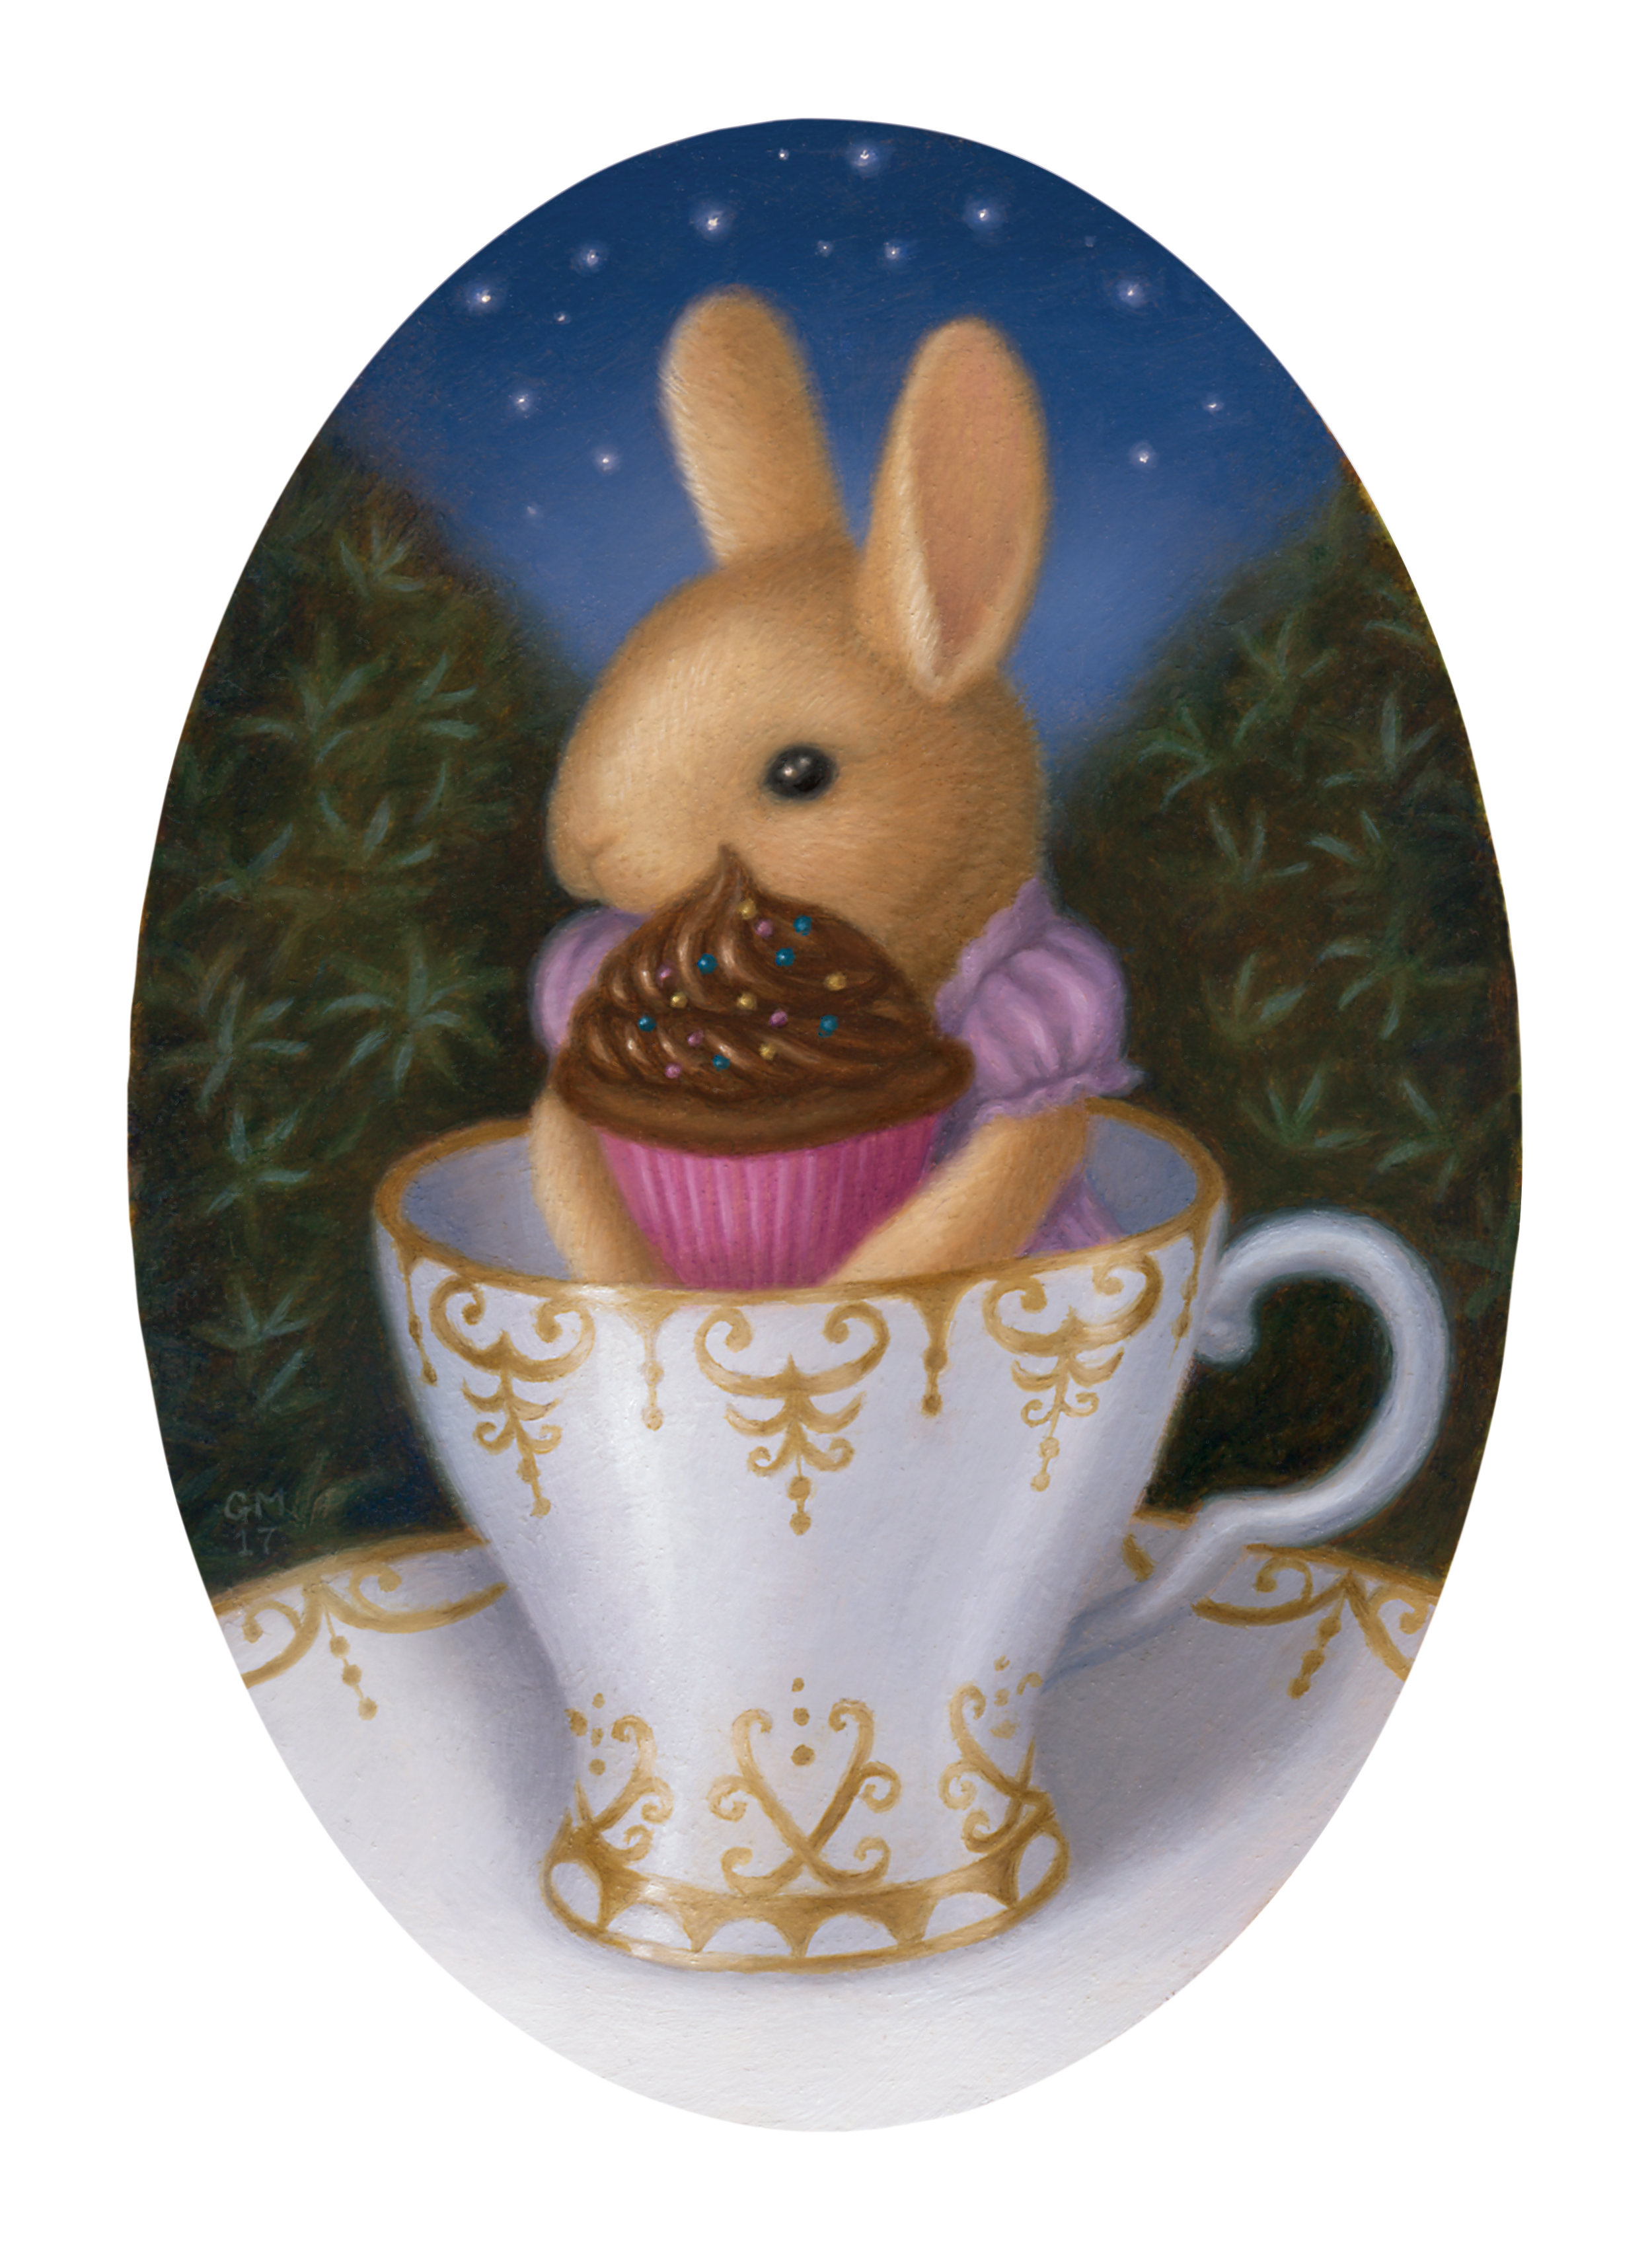 Bunny_Rabbit_Nature_Tea_Cup_Fantasy_Gina_Matarazzo.jpg